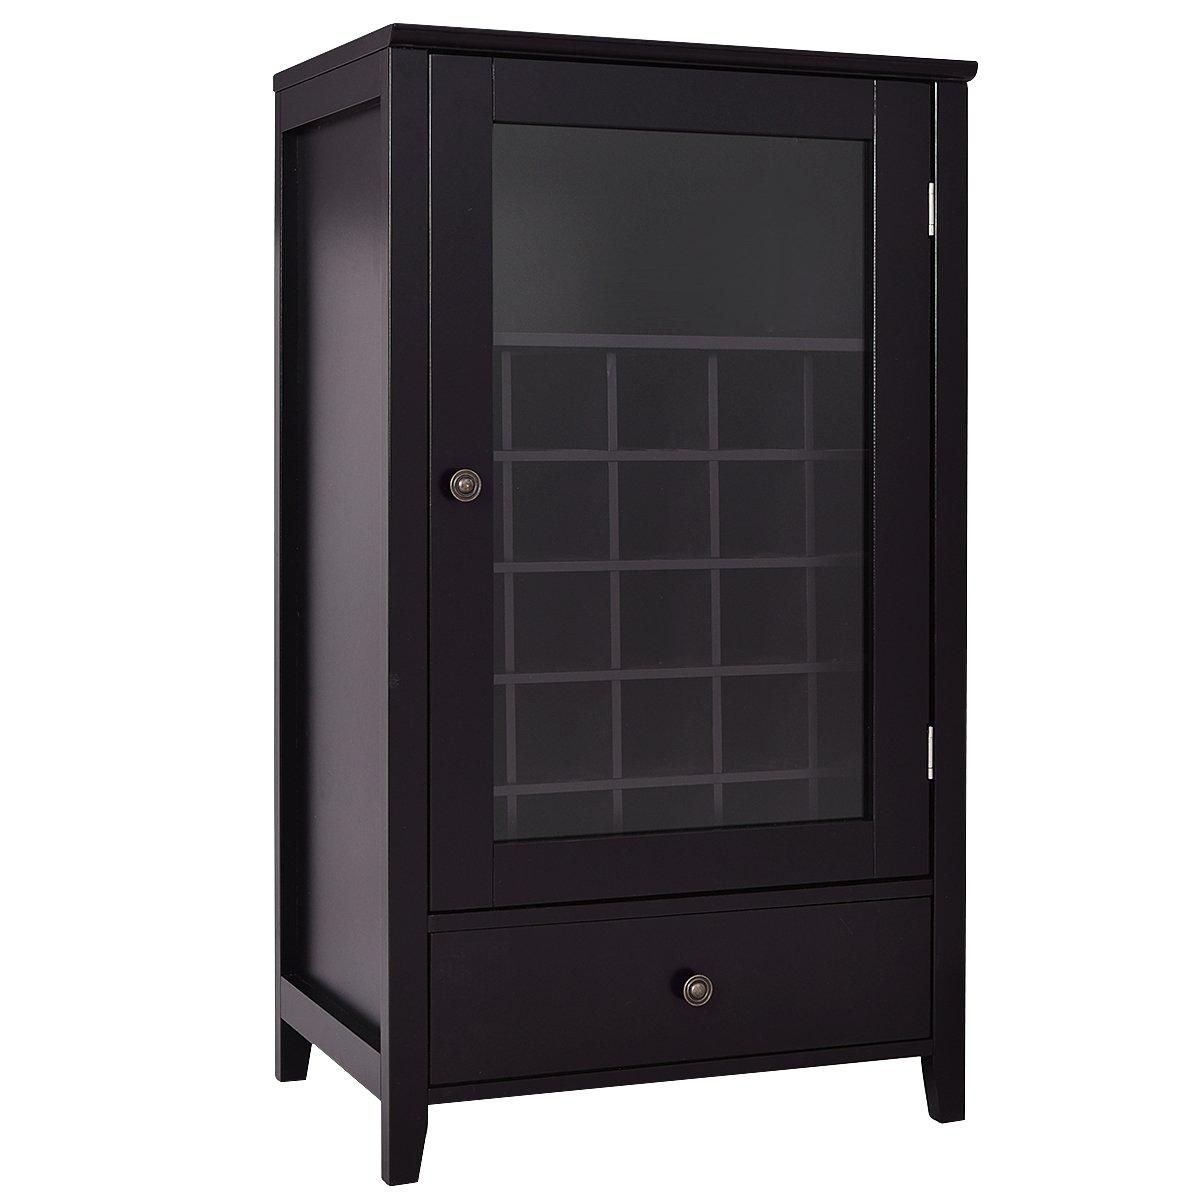 Giantex Wood Wine Cabinet Storage Home Shelf Wine Bottle Holder w/Drawer Brown